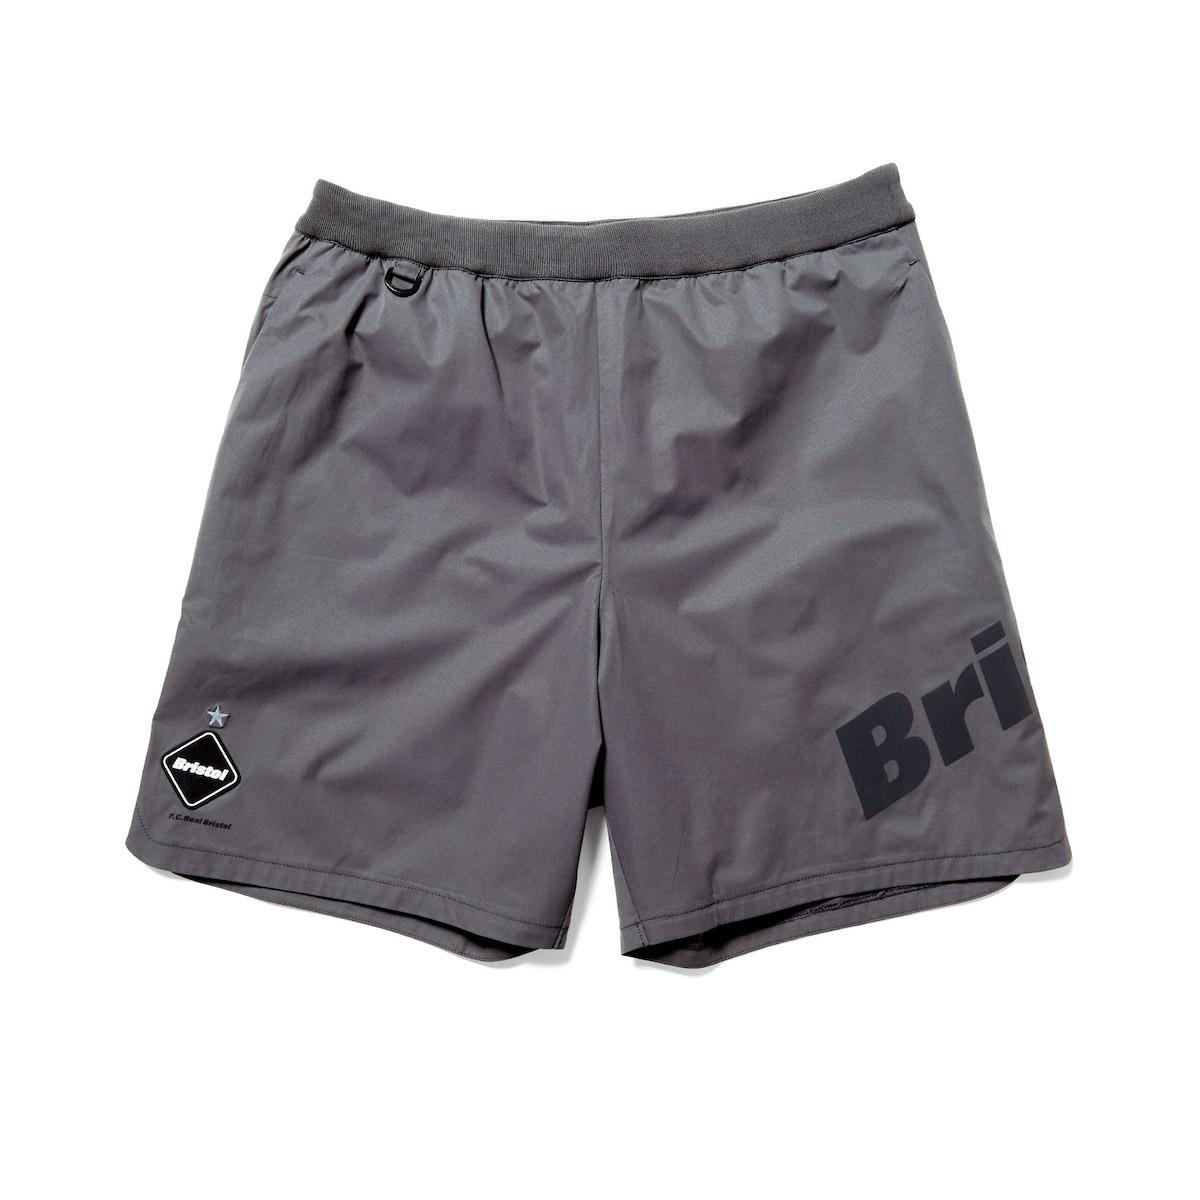 F.C.Real Bristol / 4WAY STRETCH SLASH SHORTS (Gray)